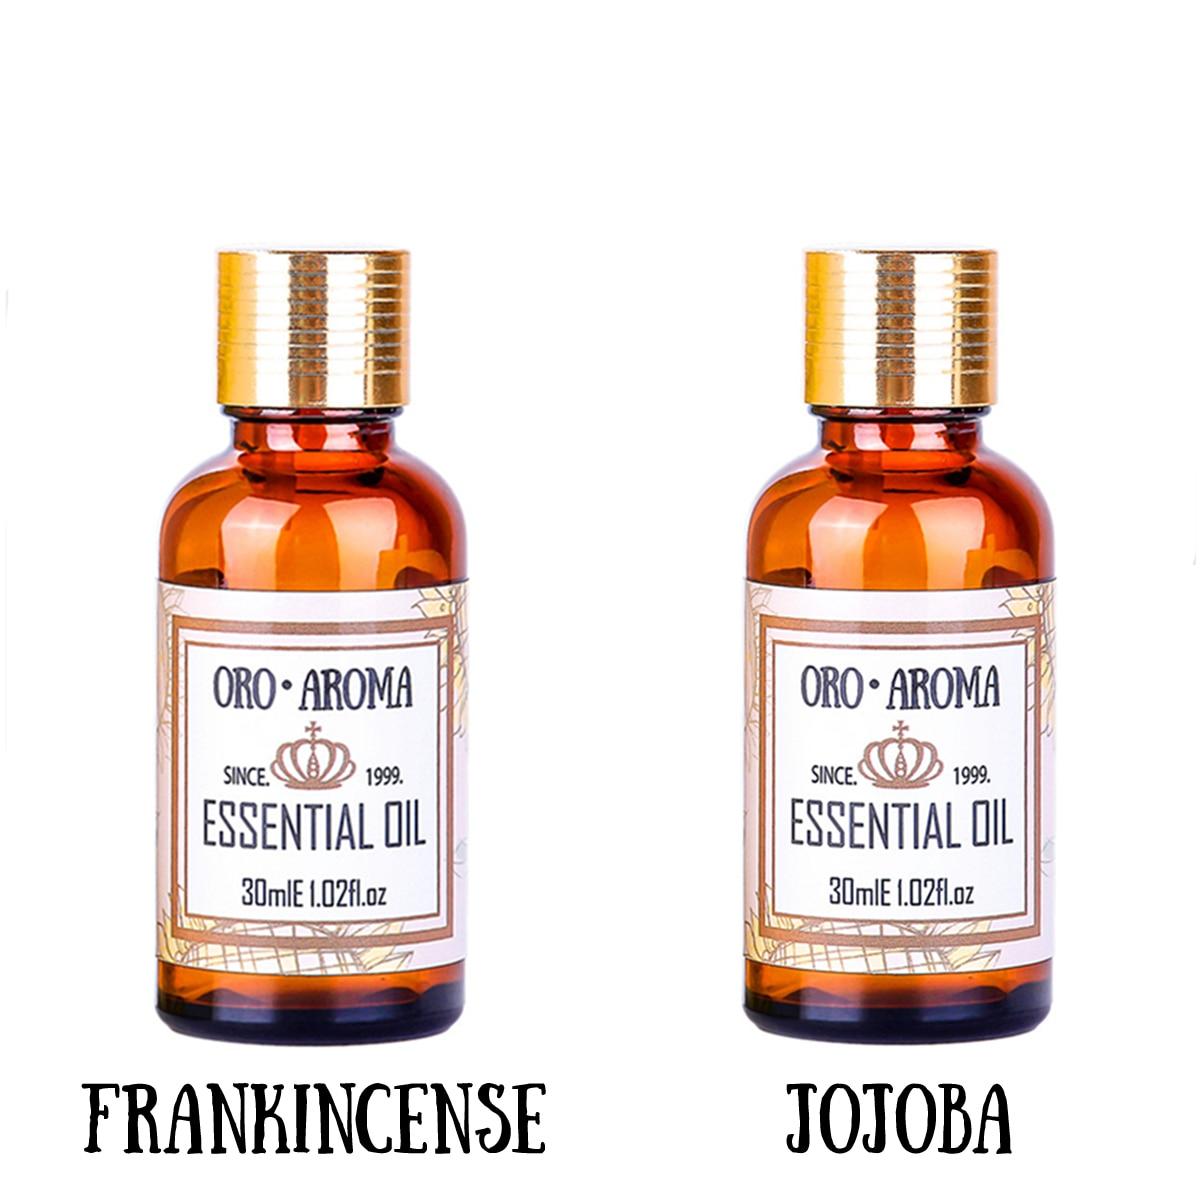 Famous Brand Oroaroma Anti Ageing Sets Frankincense Essential Oil Jojoba Oil Repair Wrinkles Scars Body Massage Oil 30ml*2